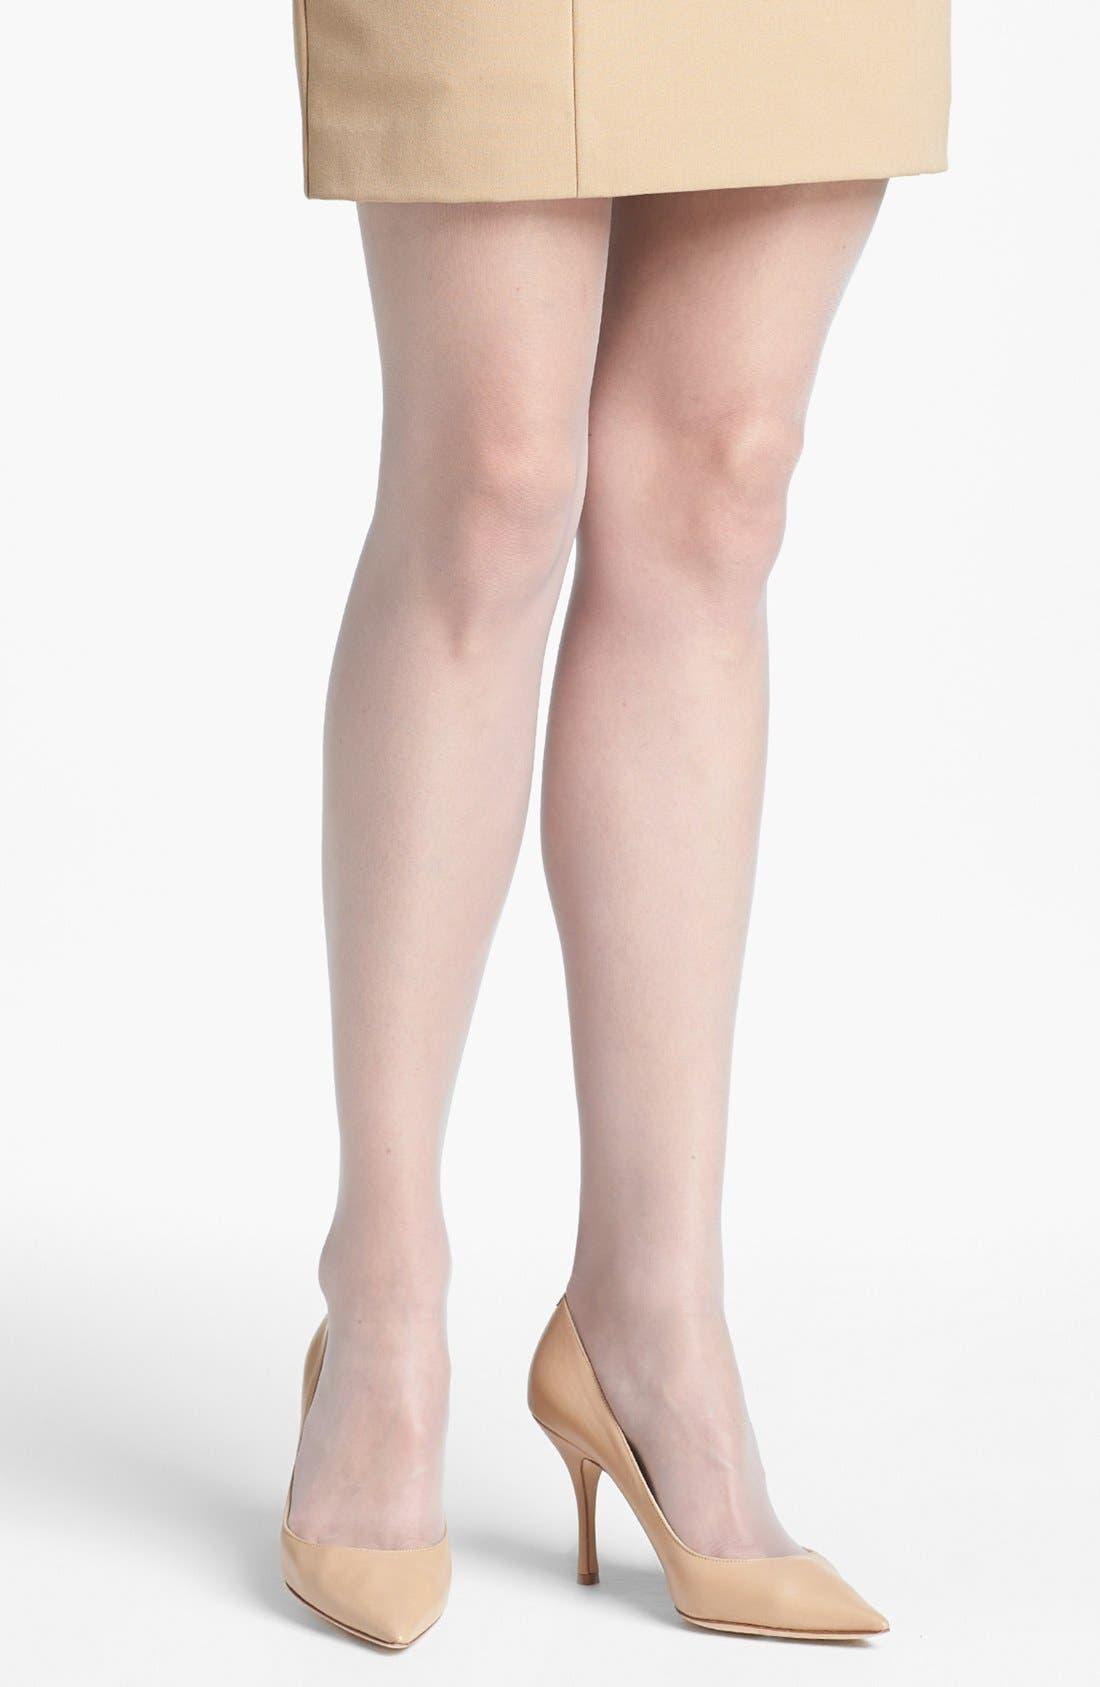 Main Image - Nordstrom 'Sheer Gloss' Pantyhose